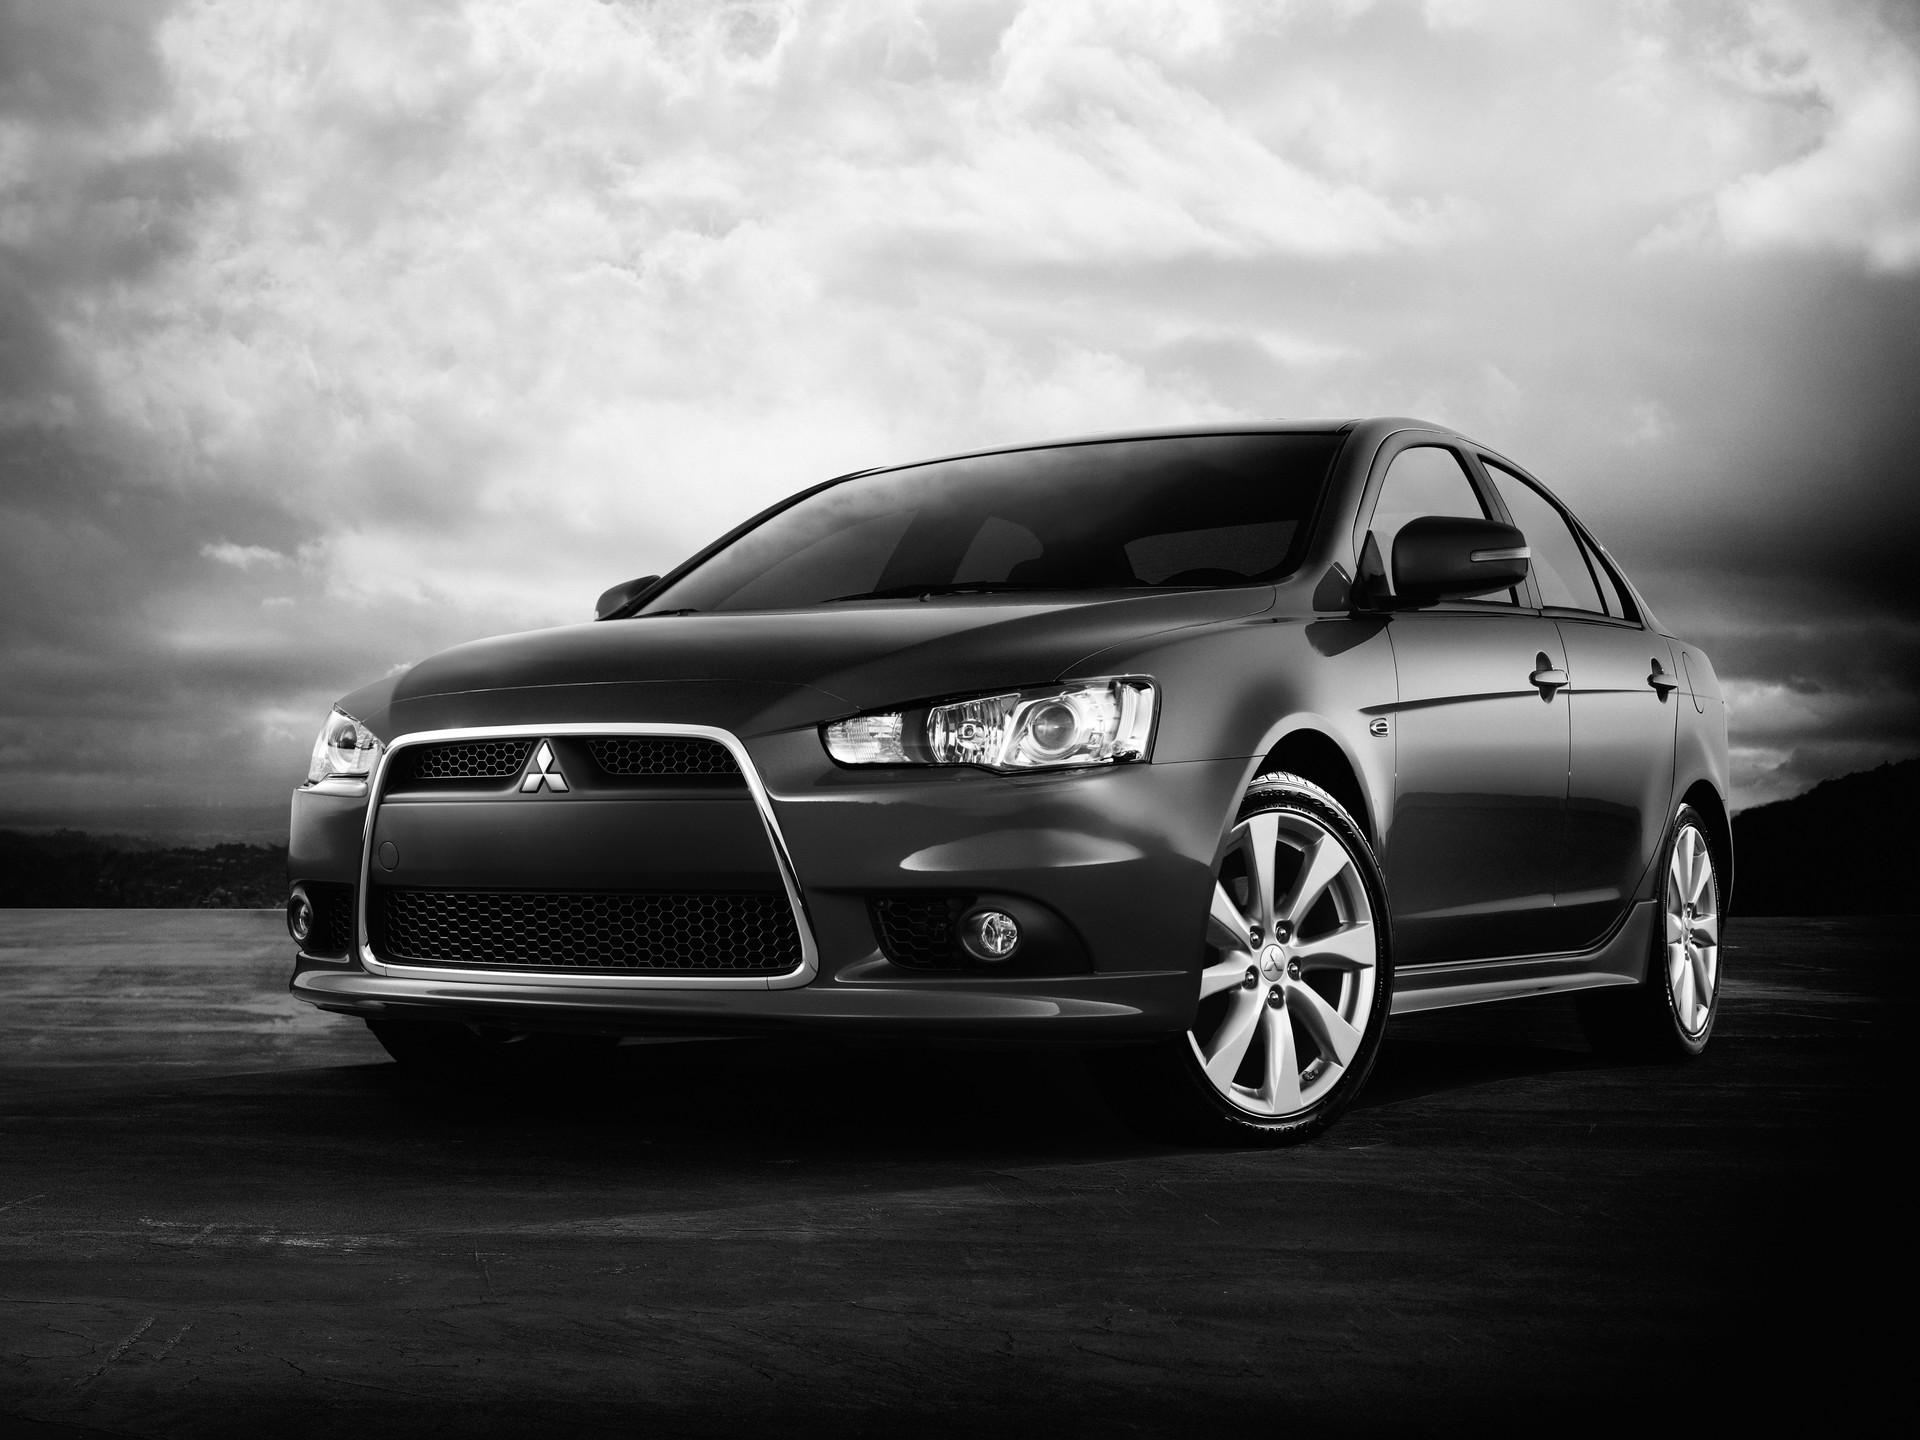 Mitsubishi Gives Up On Sedans To Make Only Suvs Henceforth